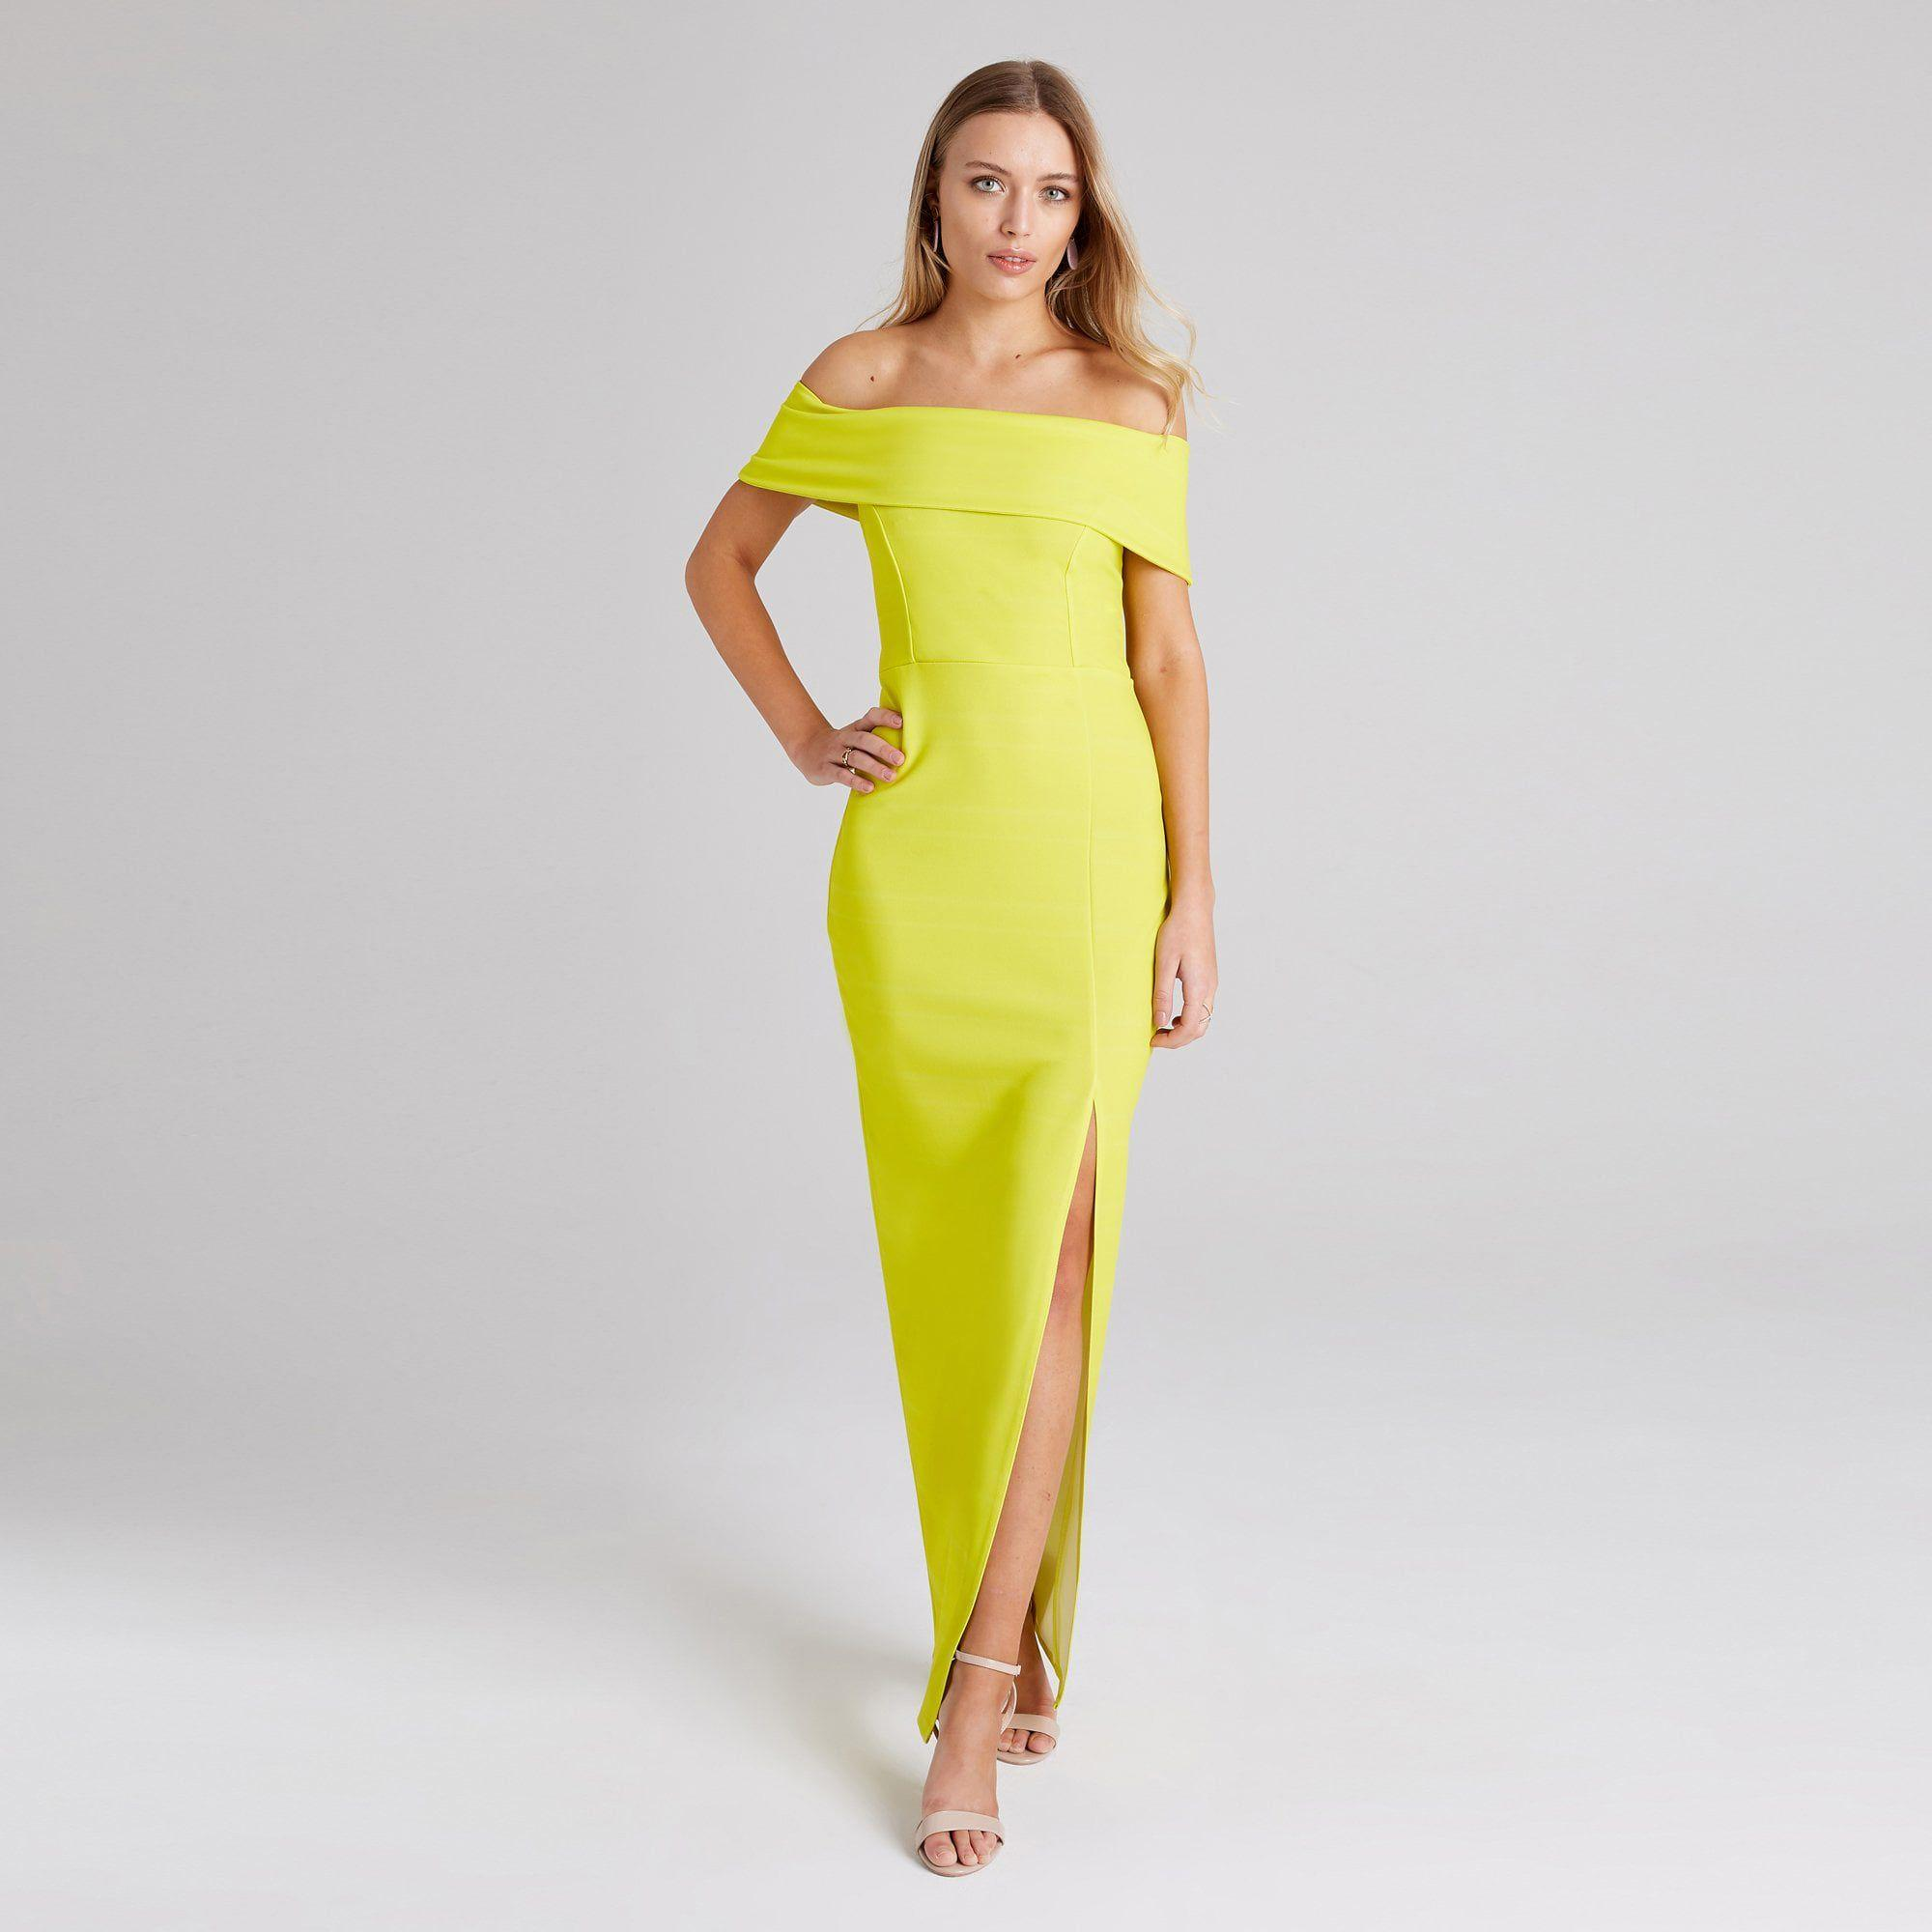 9bf1002f02d5 Girls On Film Yellow Alva Bardot Maxi Dress in Yellow - Lyst